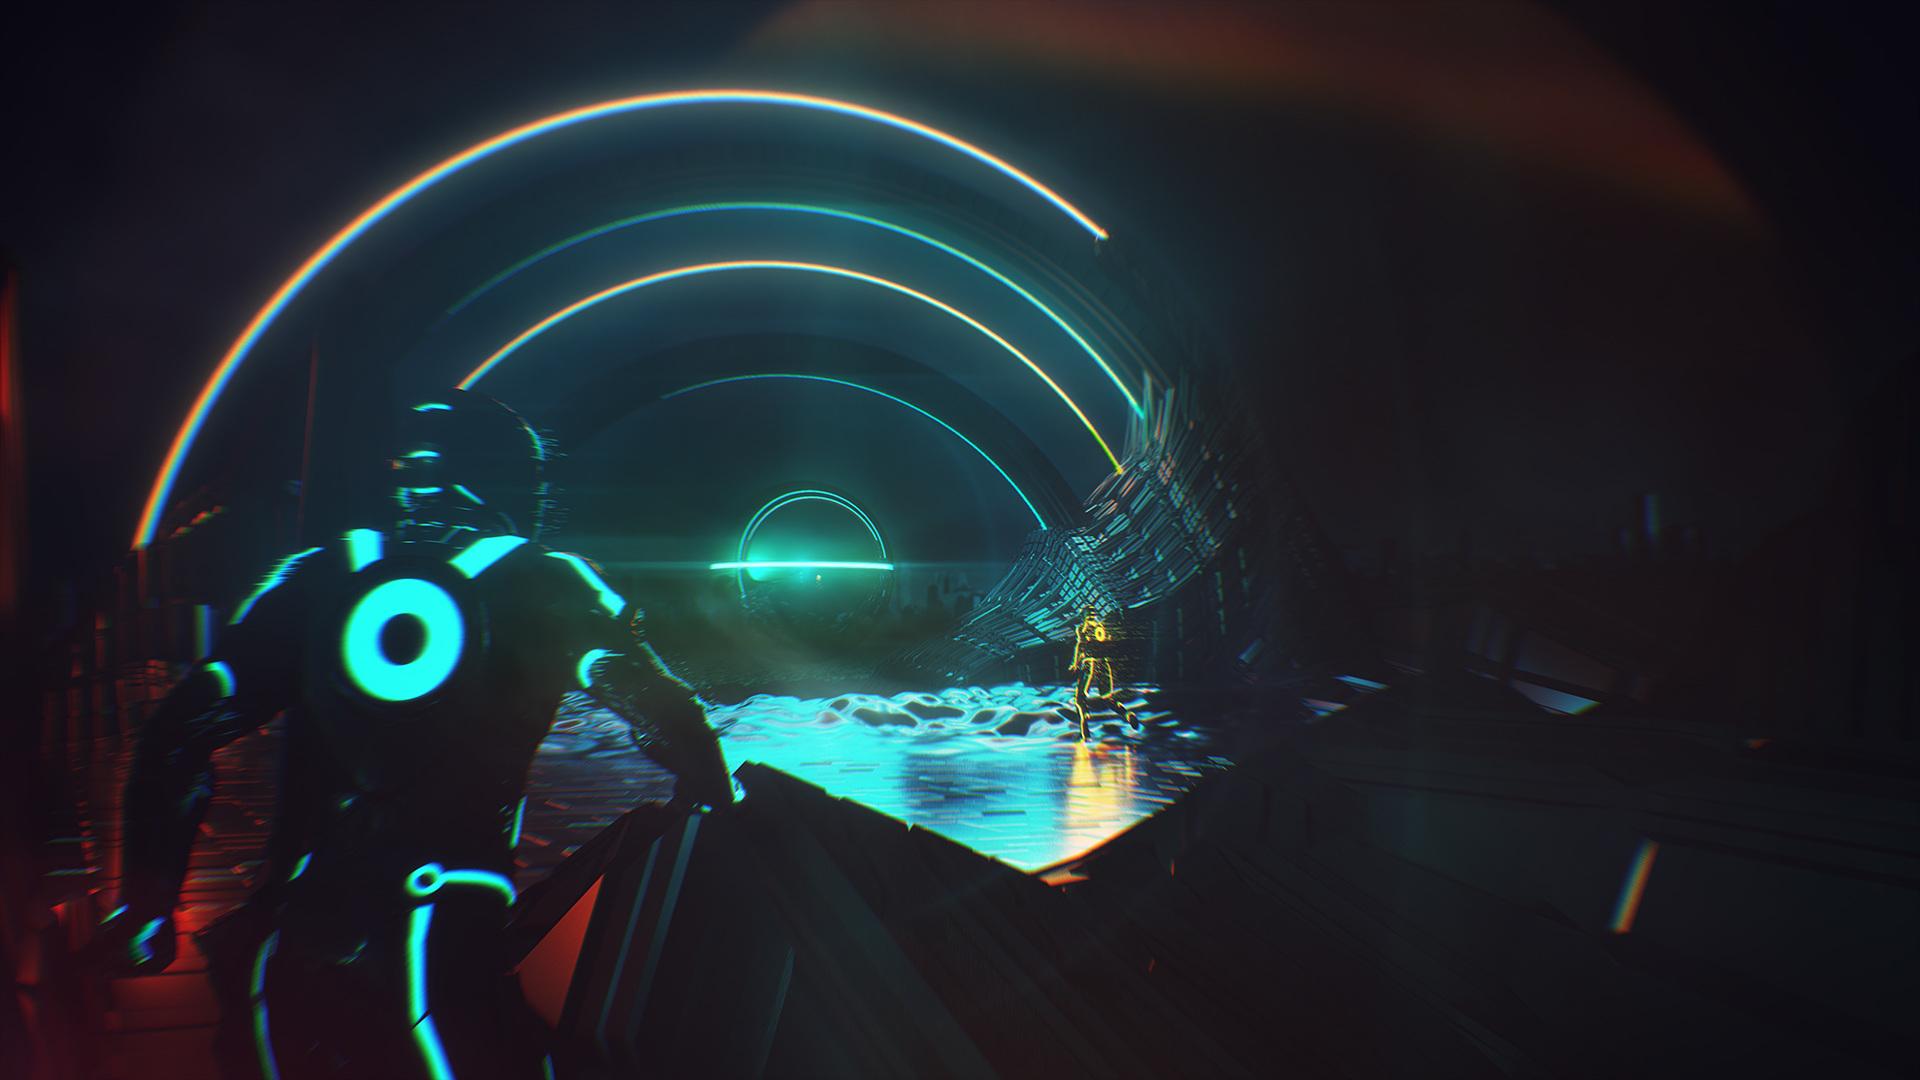 Digital Art & Game Design: TRON Concepts